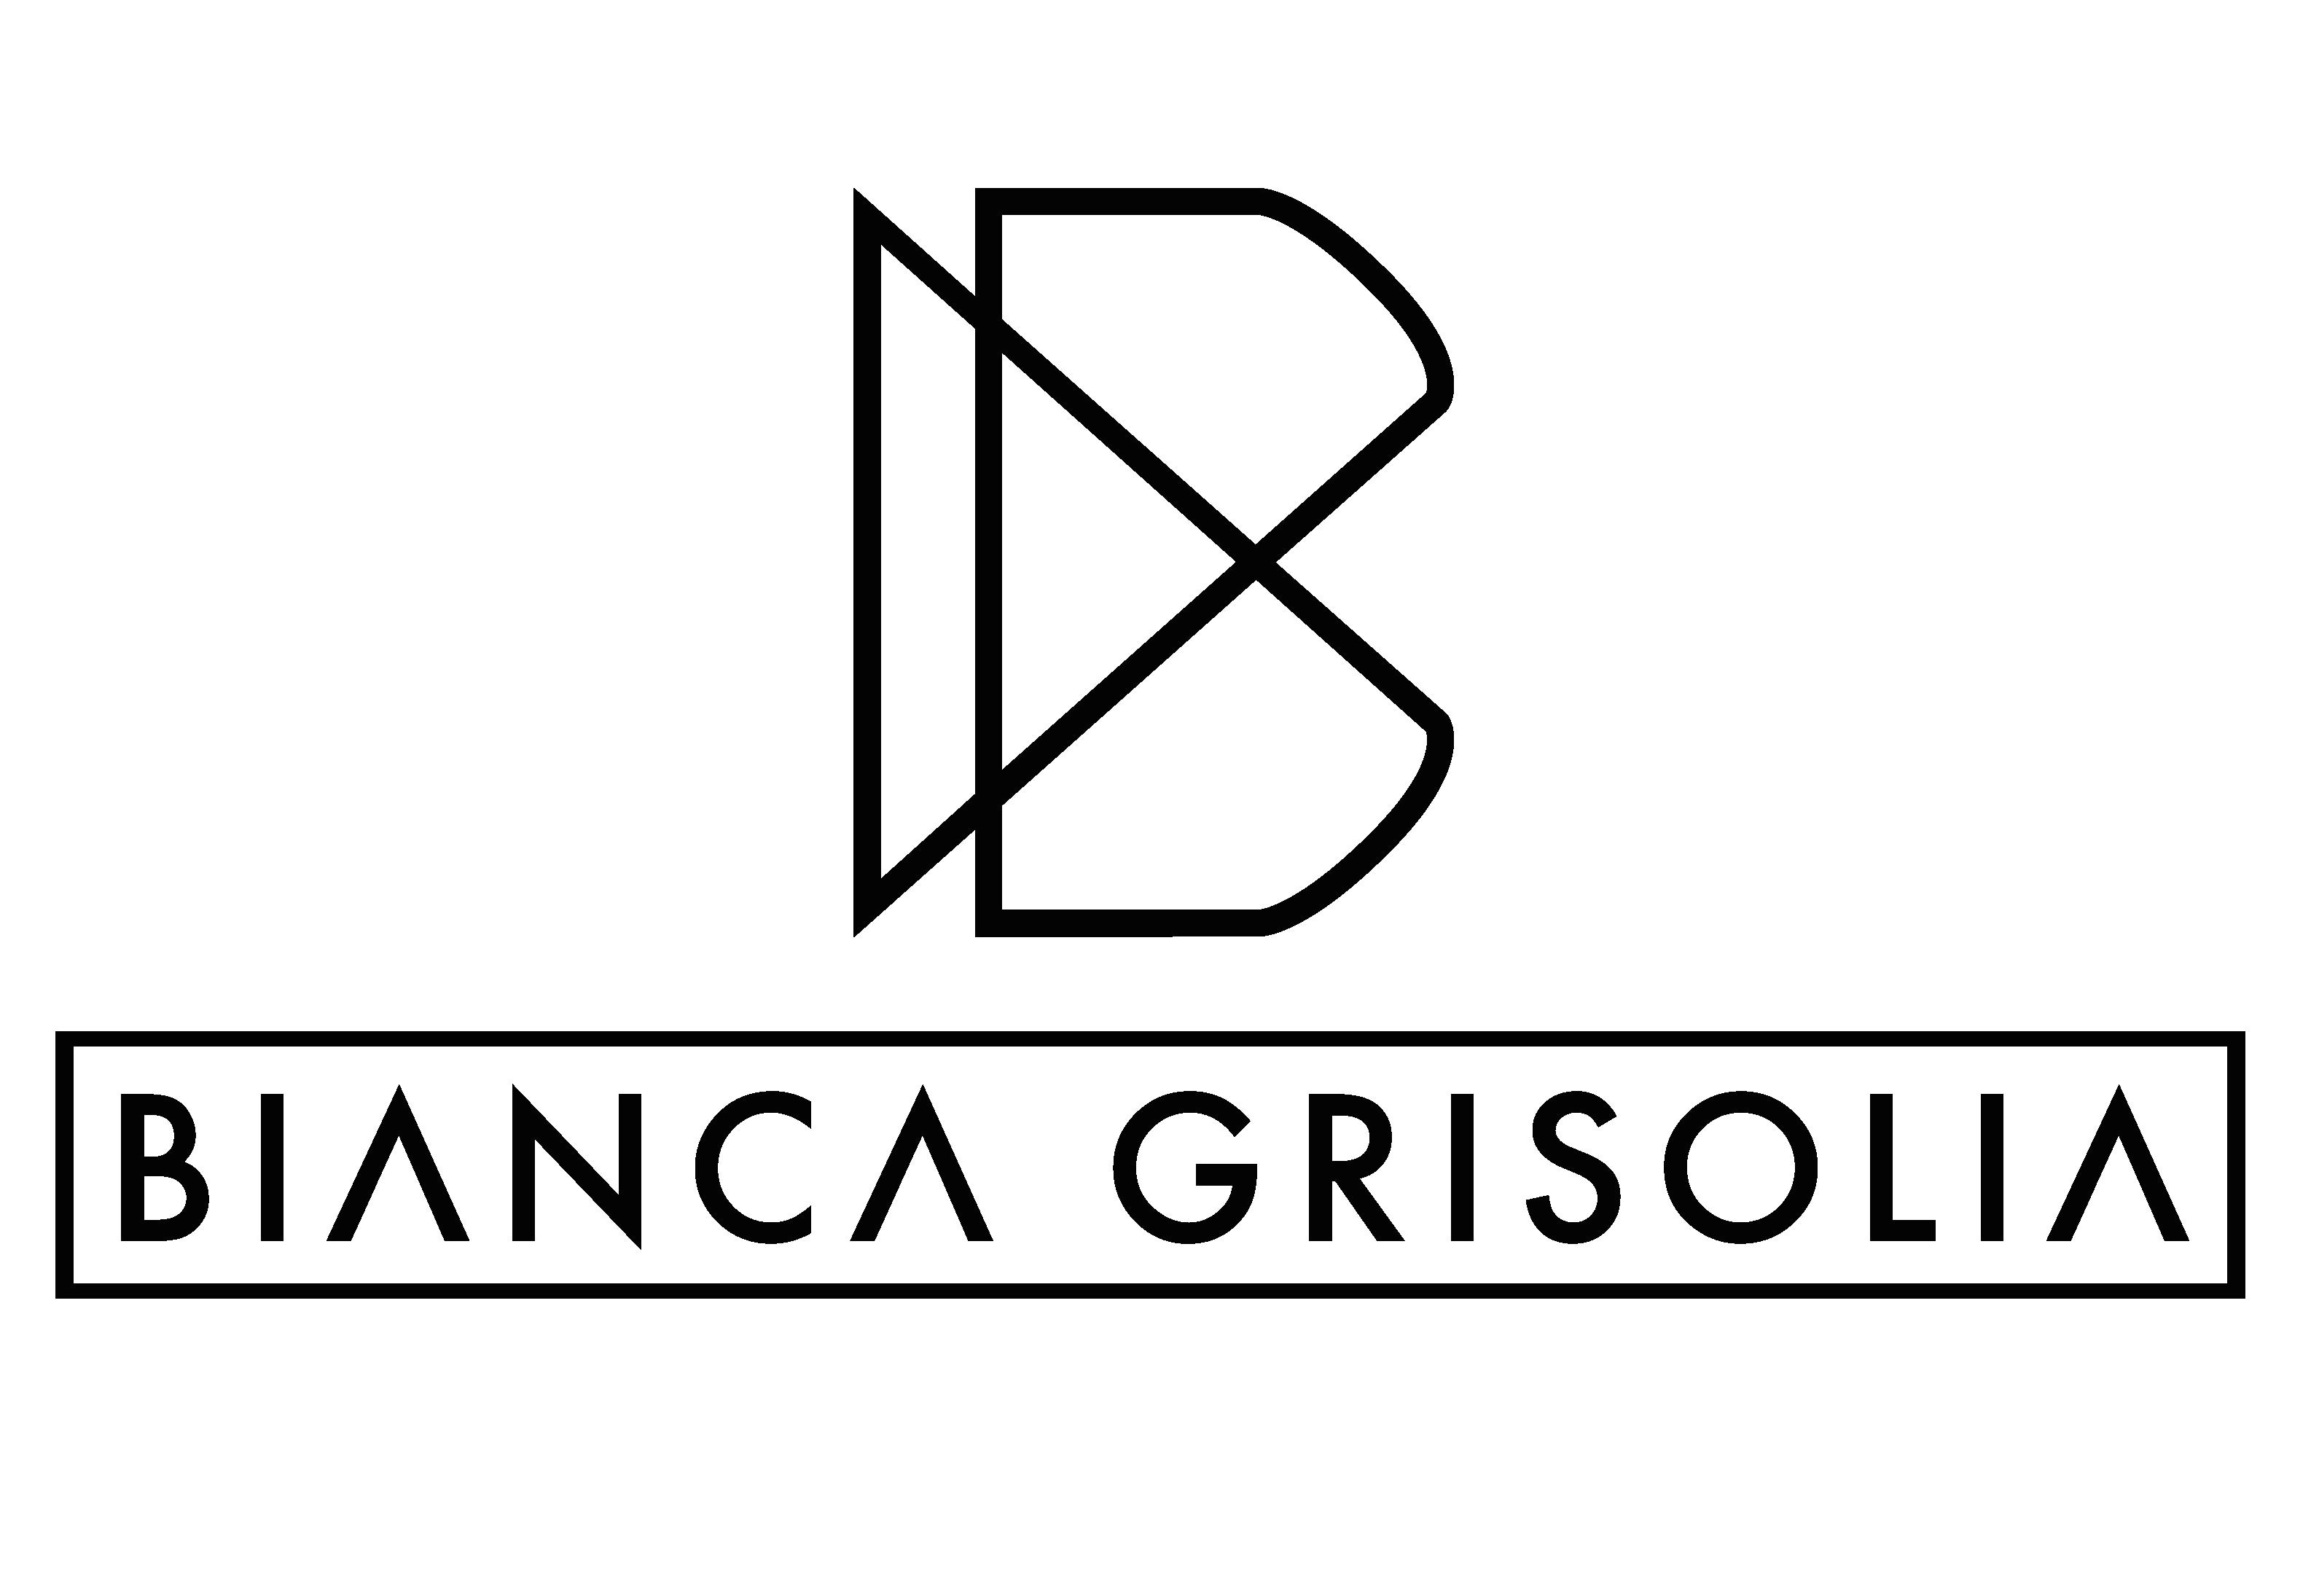 Bianca Grisolia-logo